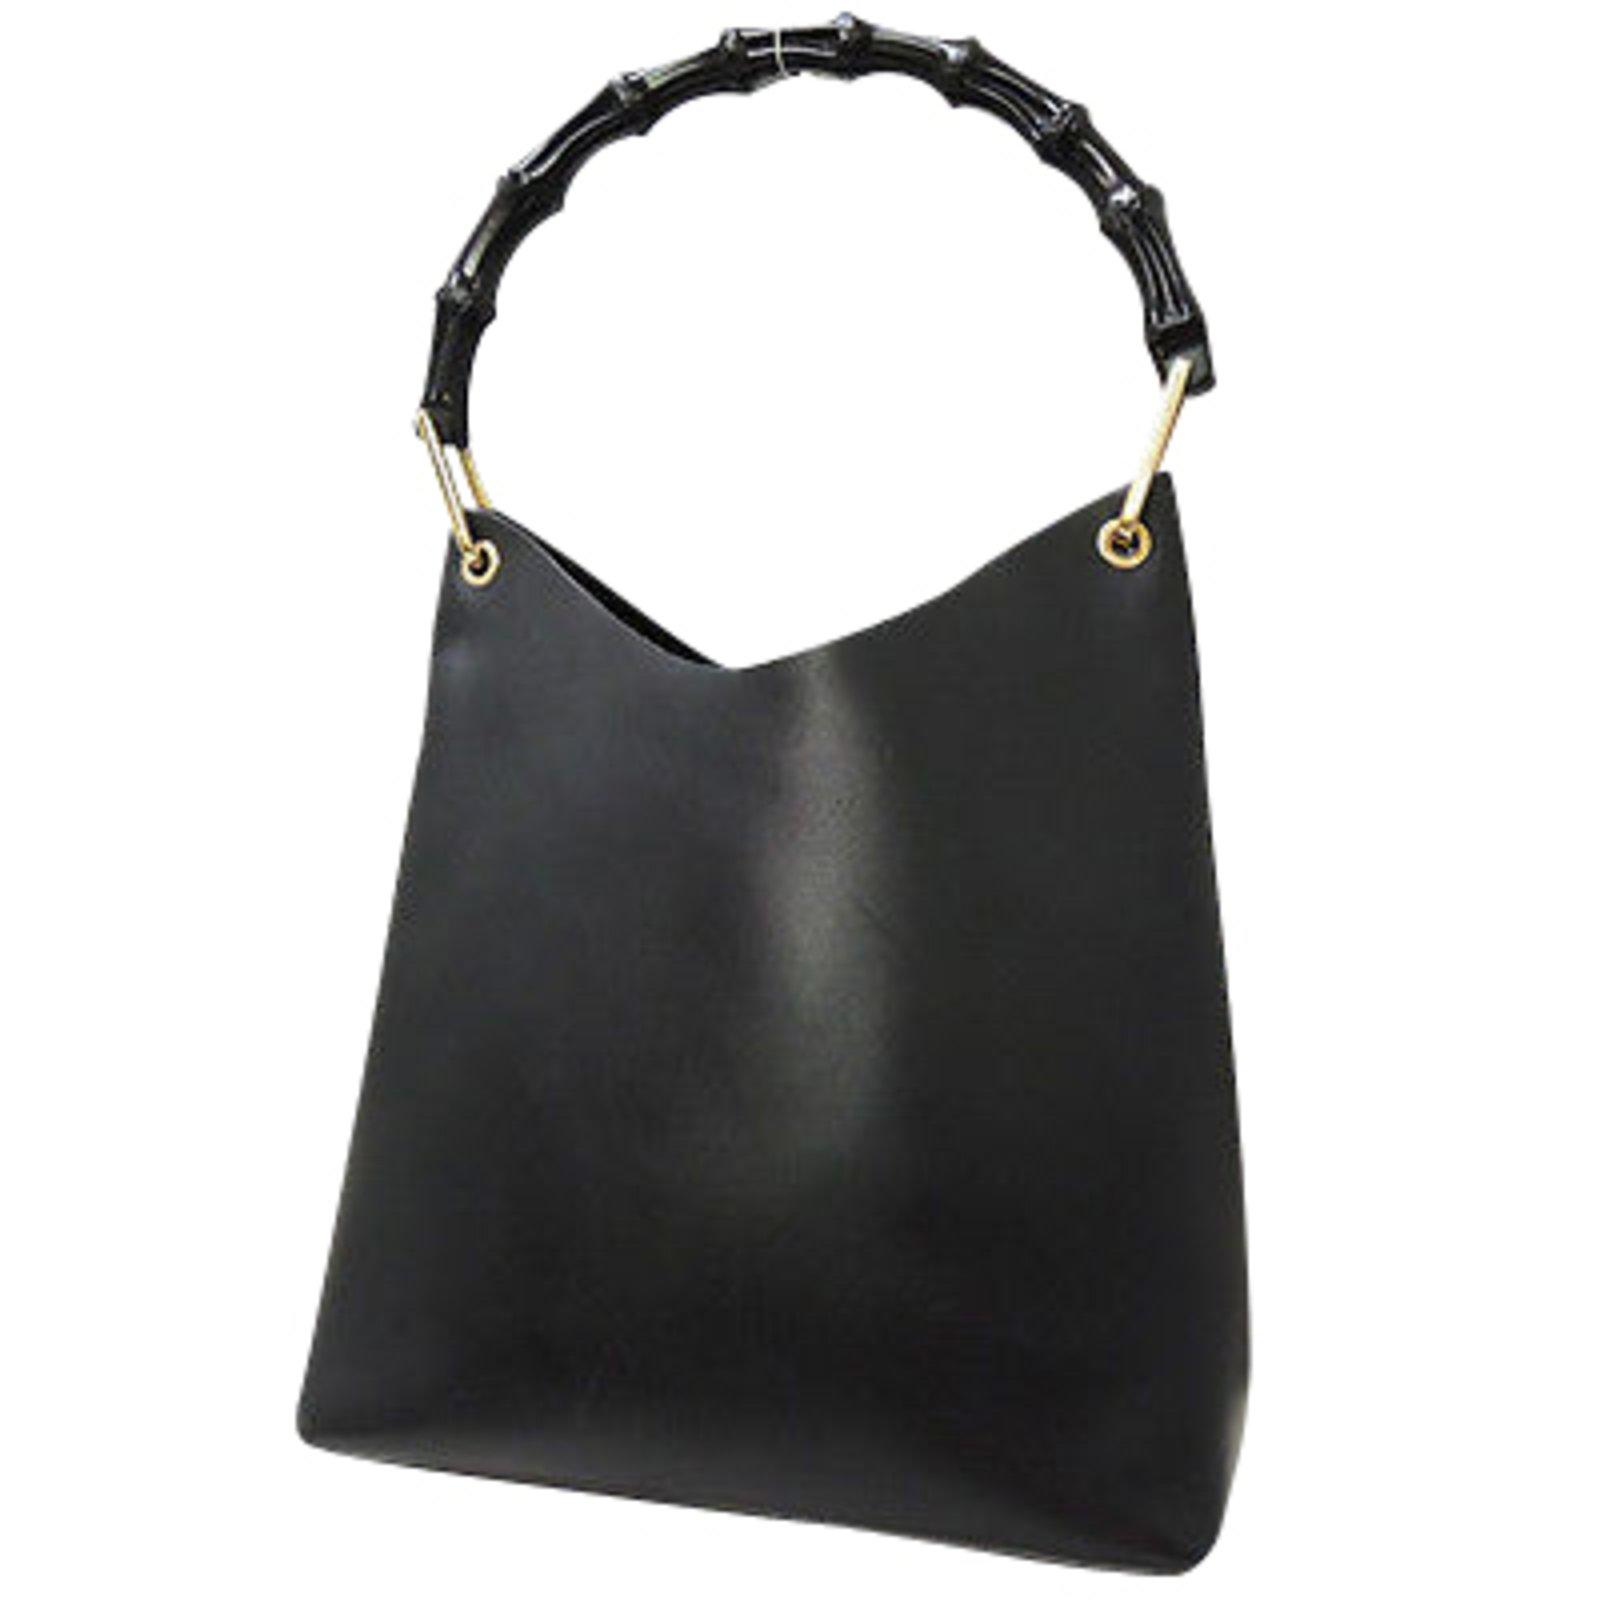 c96bbfacdf1 Gucci Hobo Handbag Handbags Leather Black ref.90844.  M 5ba8384b2beb79da16973b07